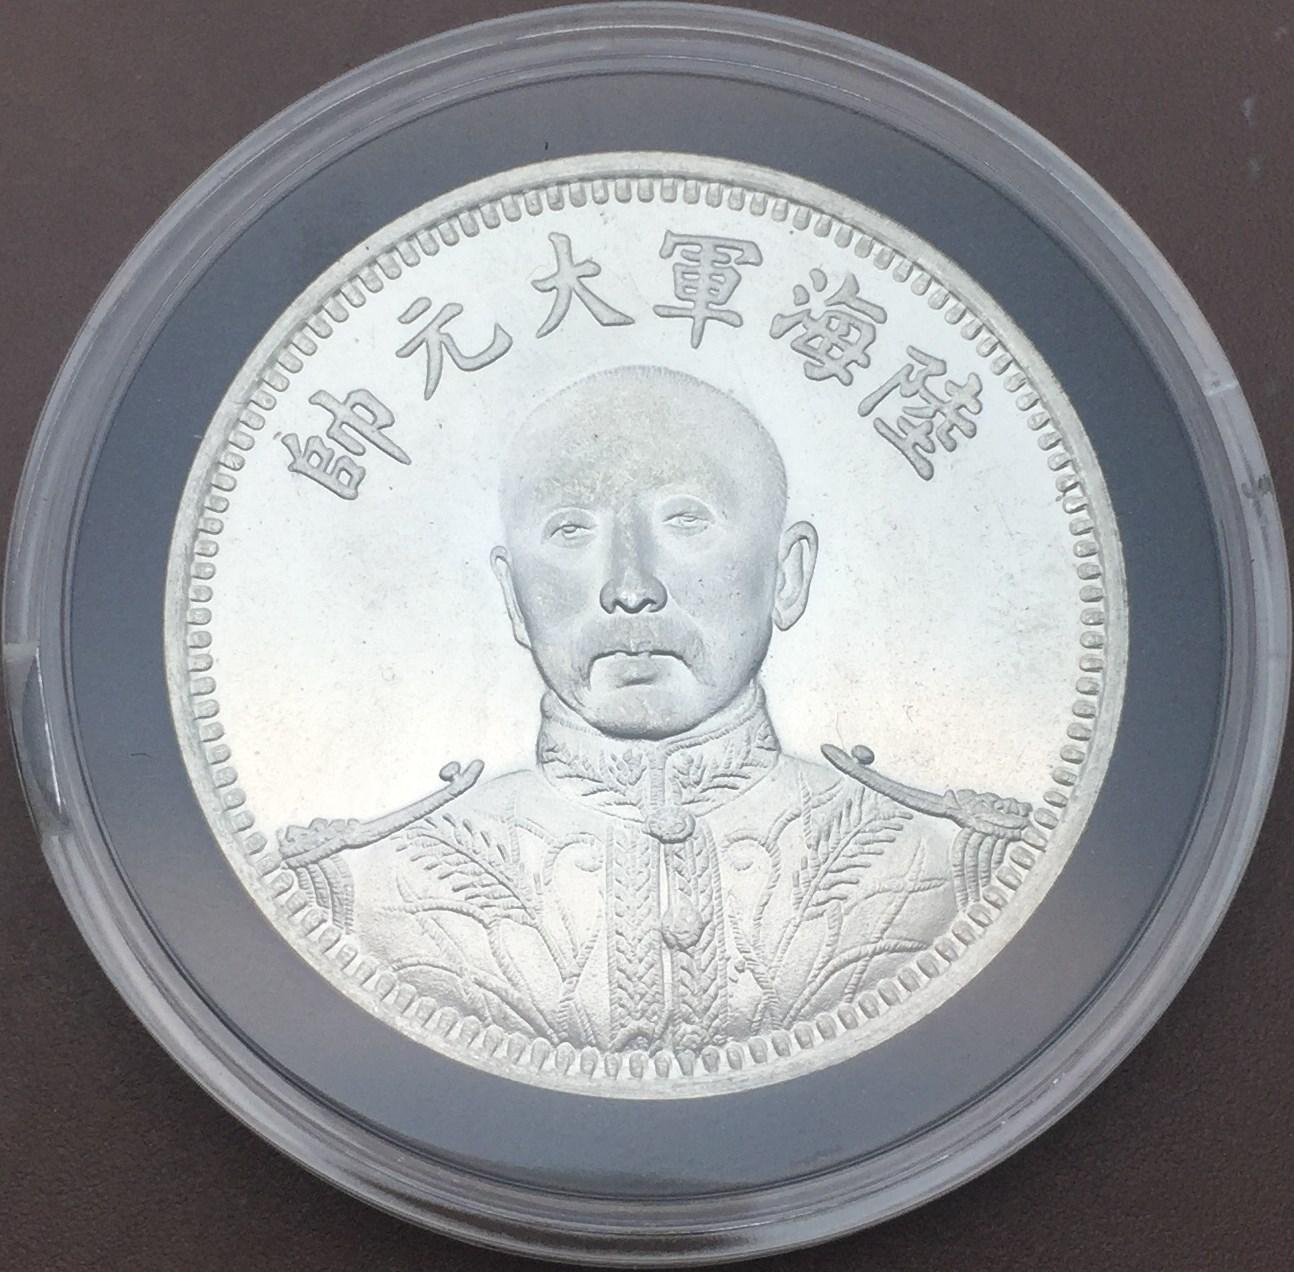 Монеты Республики Китай Артикул 595141739600